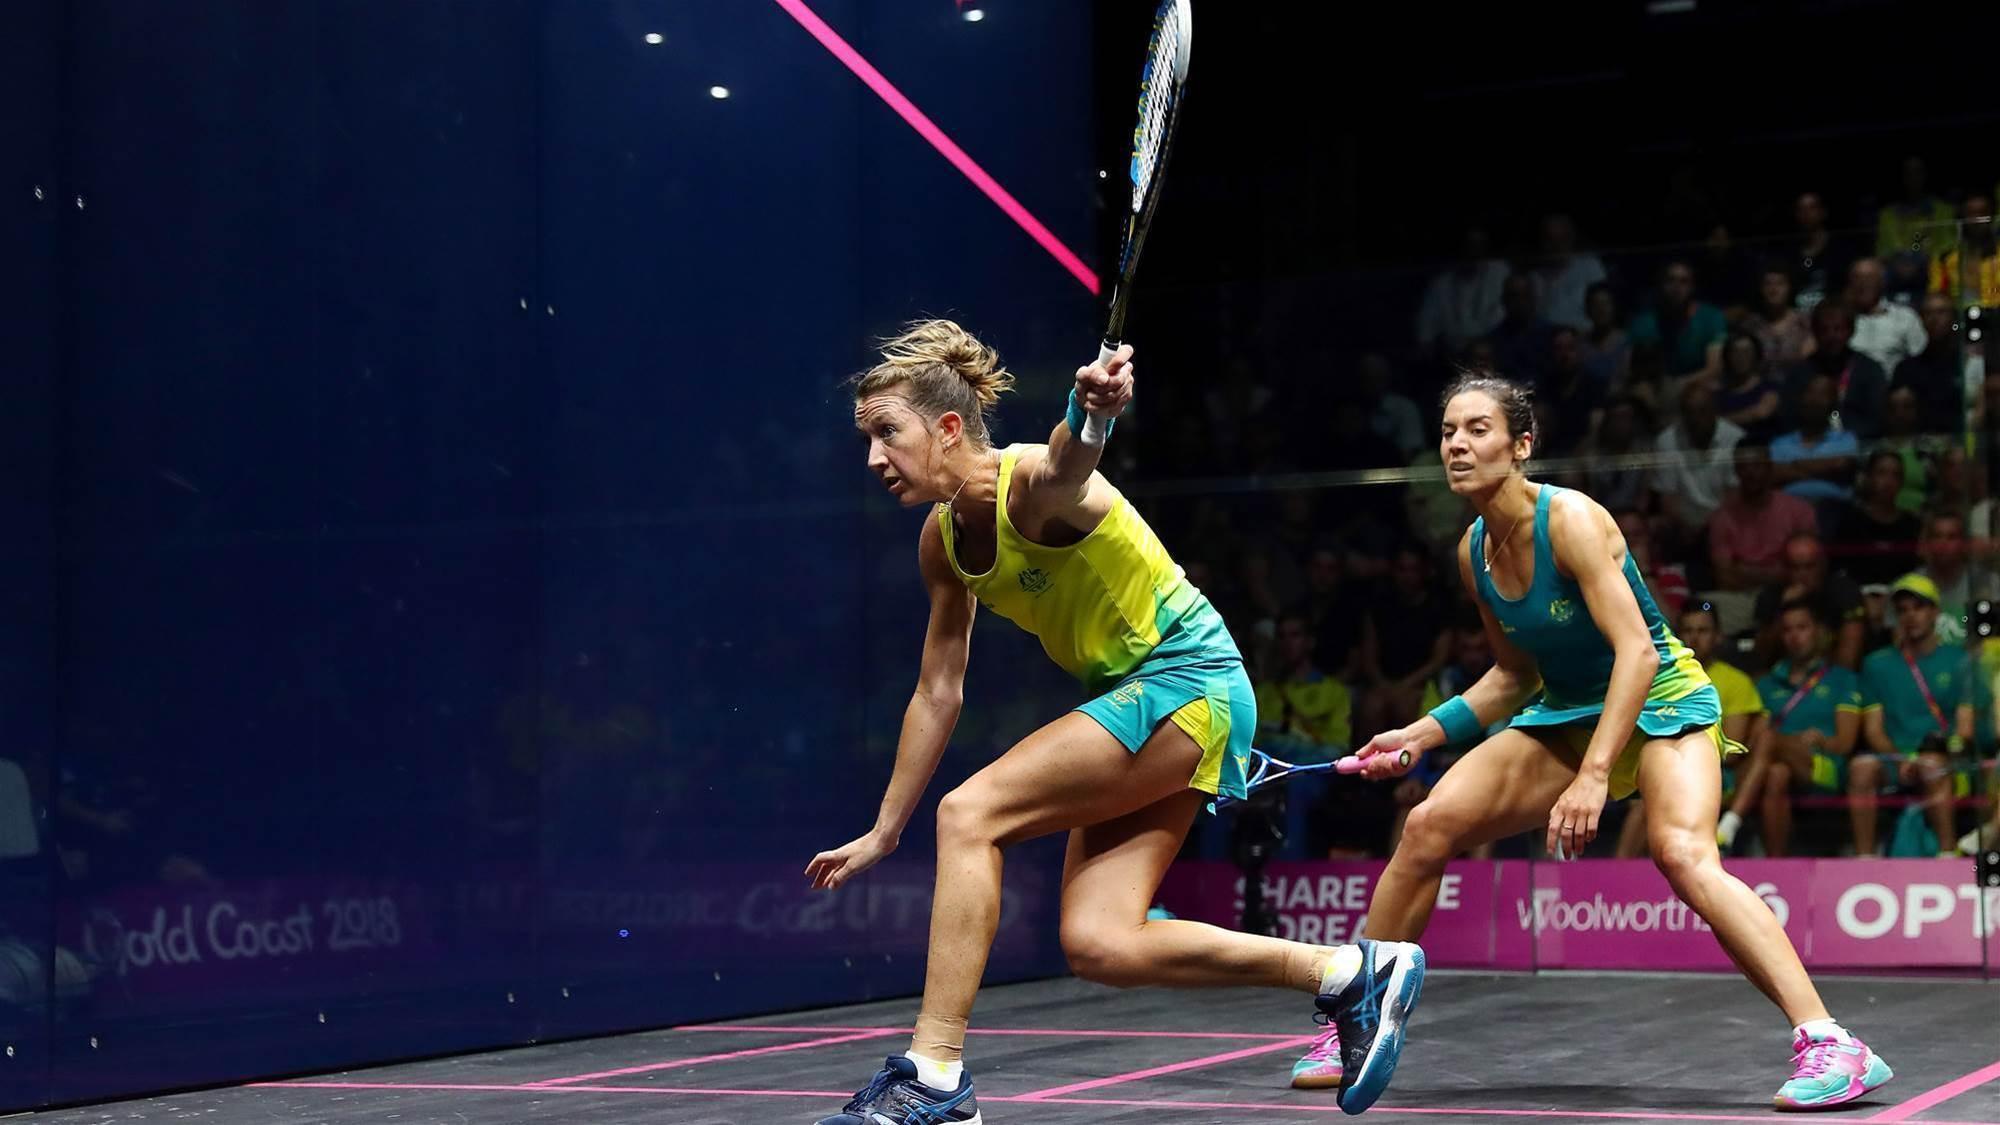 Urquhart advances to first singles quarterfinal